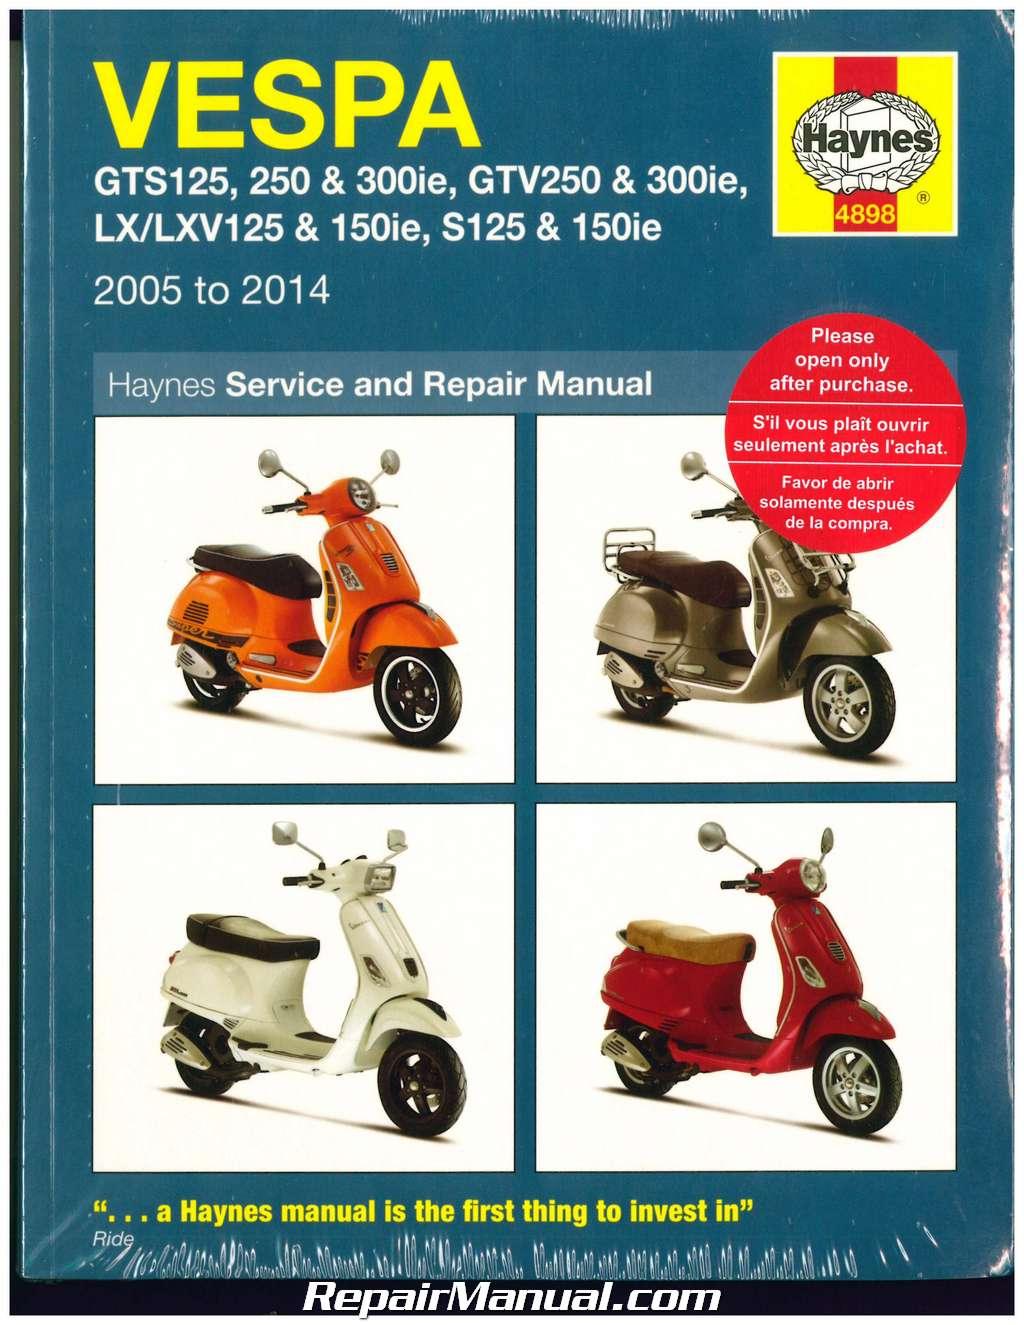 vespa scooters haynes repair manual 2005 2014 gts125 250. Black Bedroom Furniture Sets. Home Design Ideas